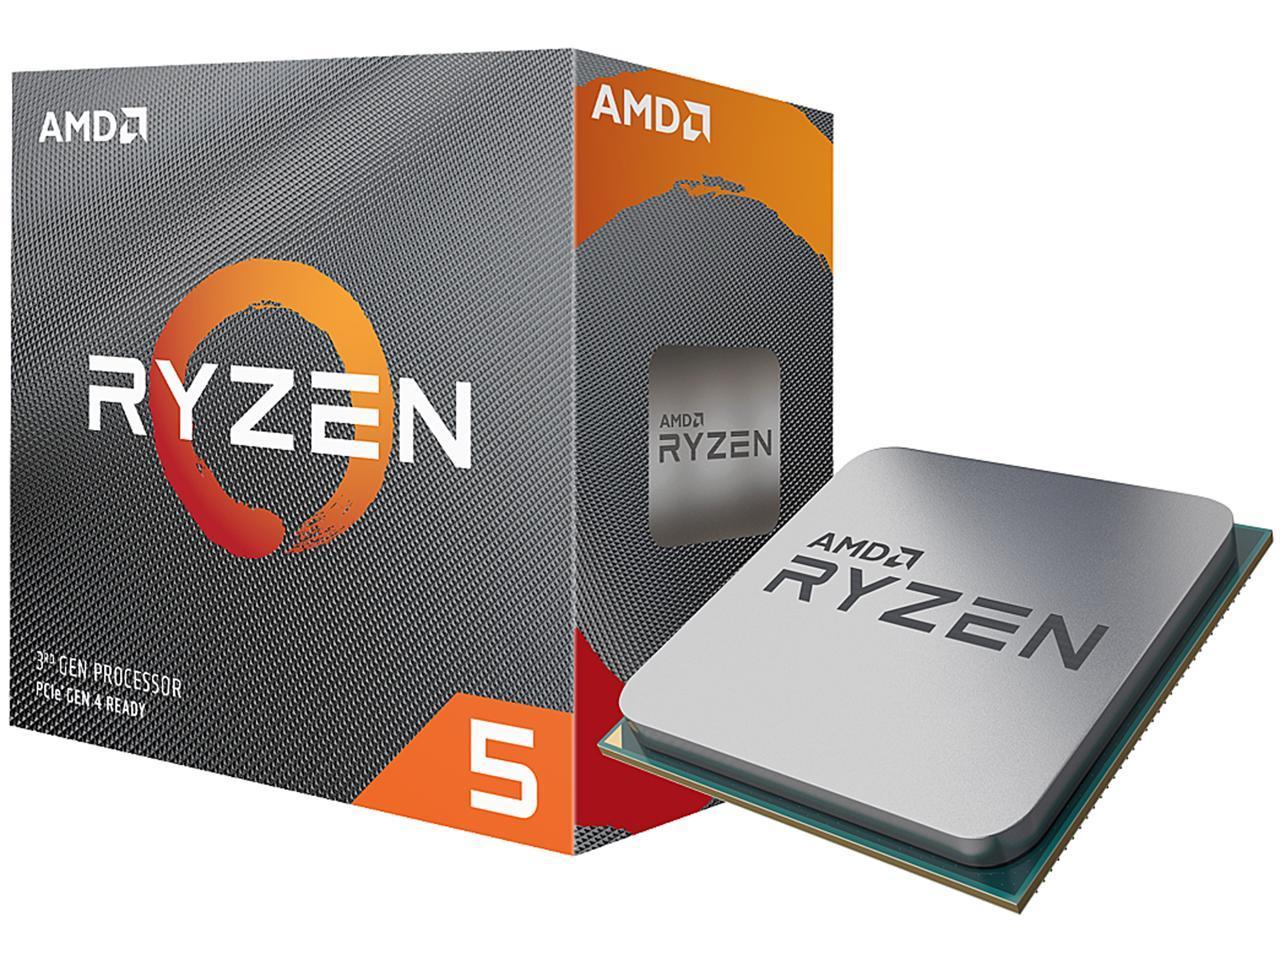 Amd Ryzen 5 3600 6 Core 3 6 Ghz 4 2 Ghz Max Boost Socket Am4 65w 100 100000031 730143309936 Ebay